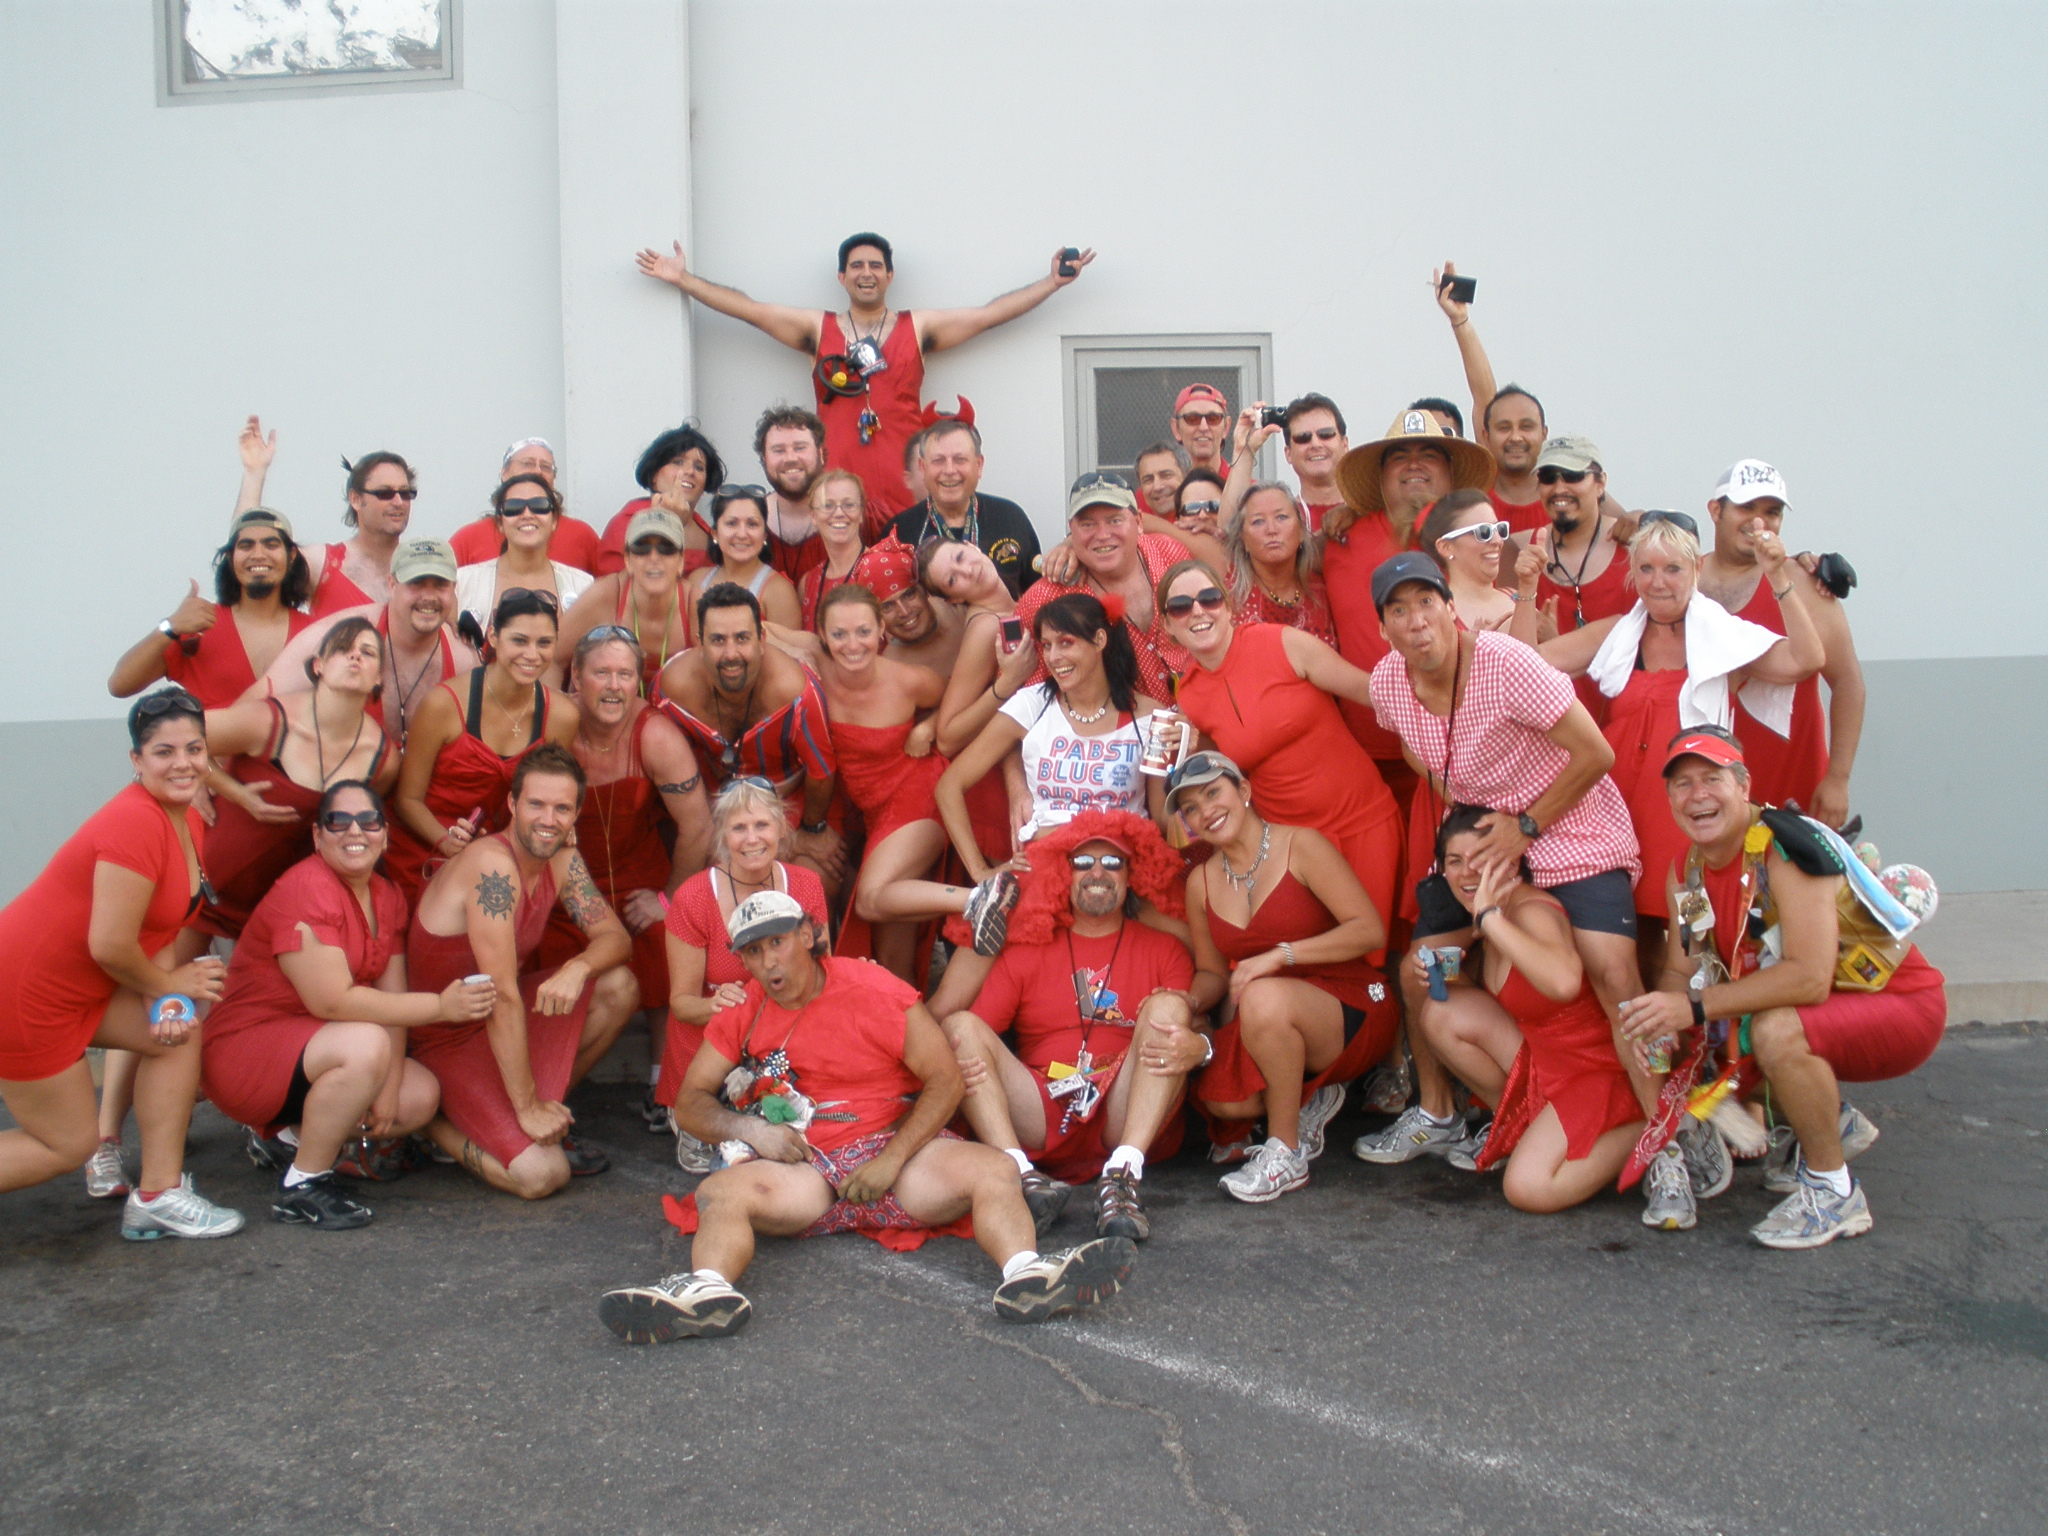 BH3 Red Dress 2009